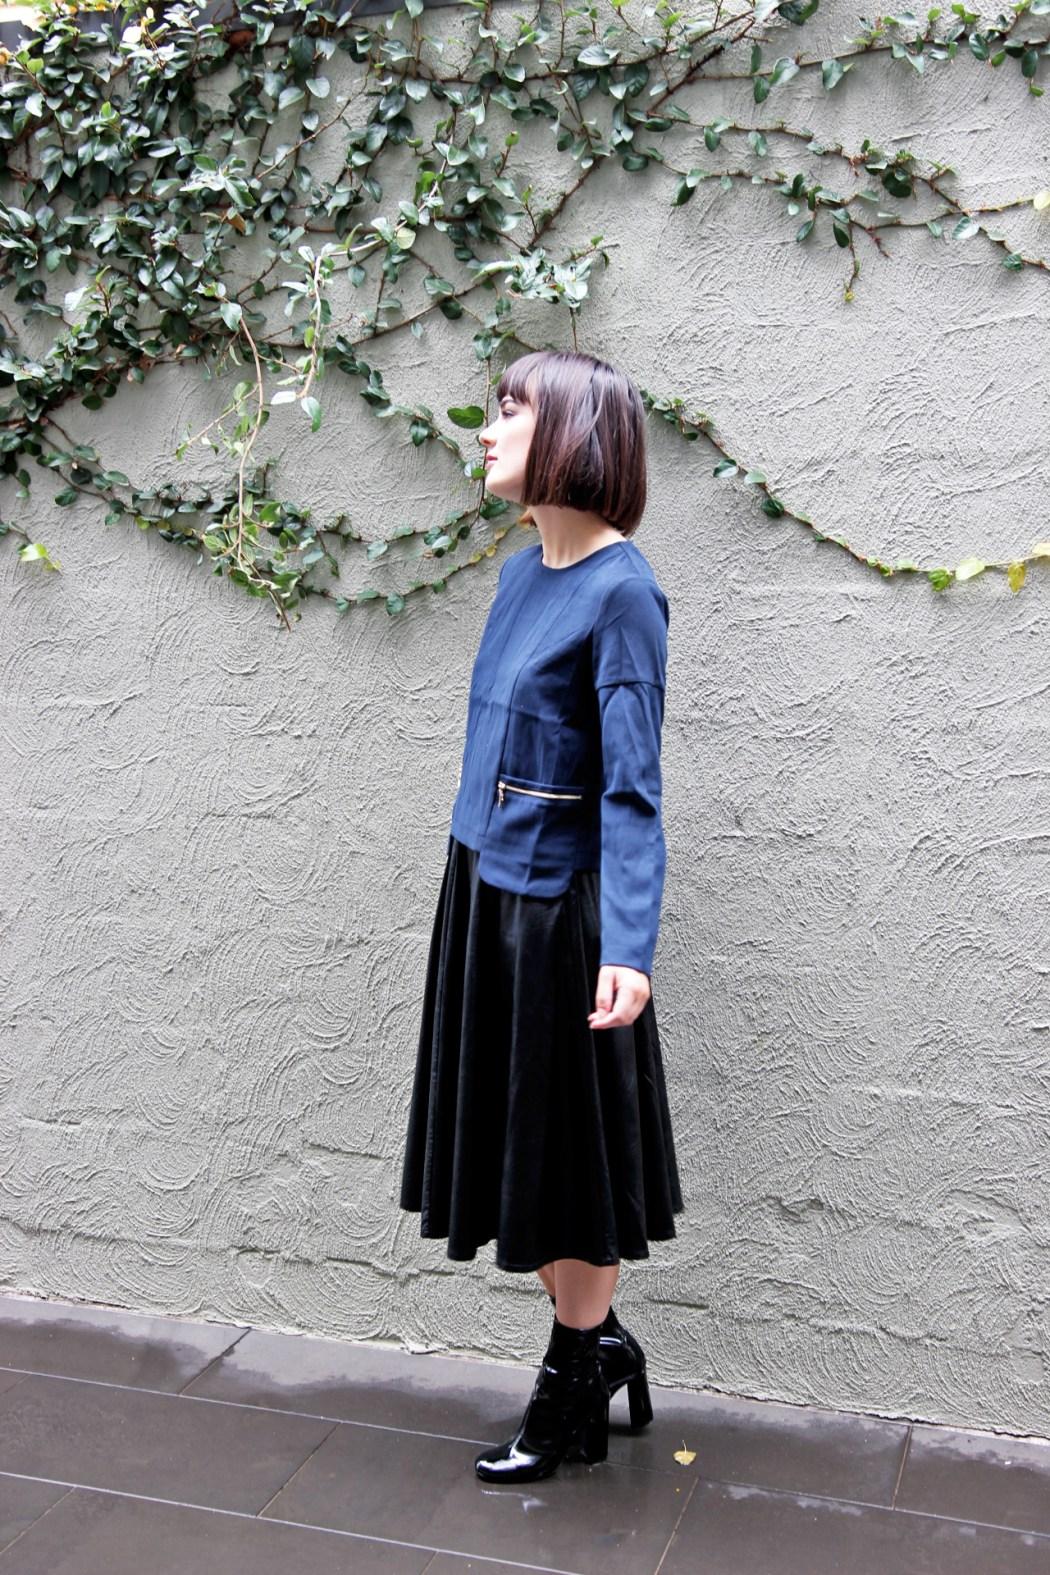 Kristen wears Minnow Top and Rockafella Skirt